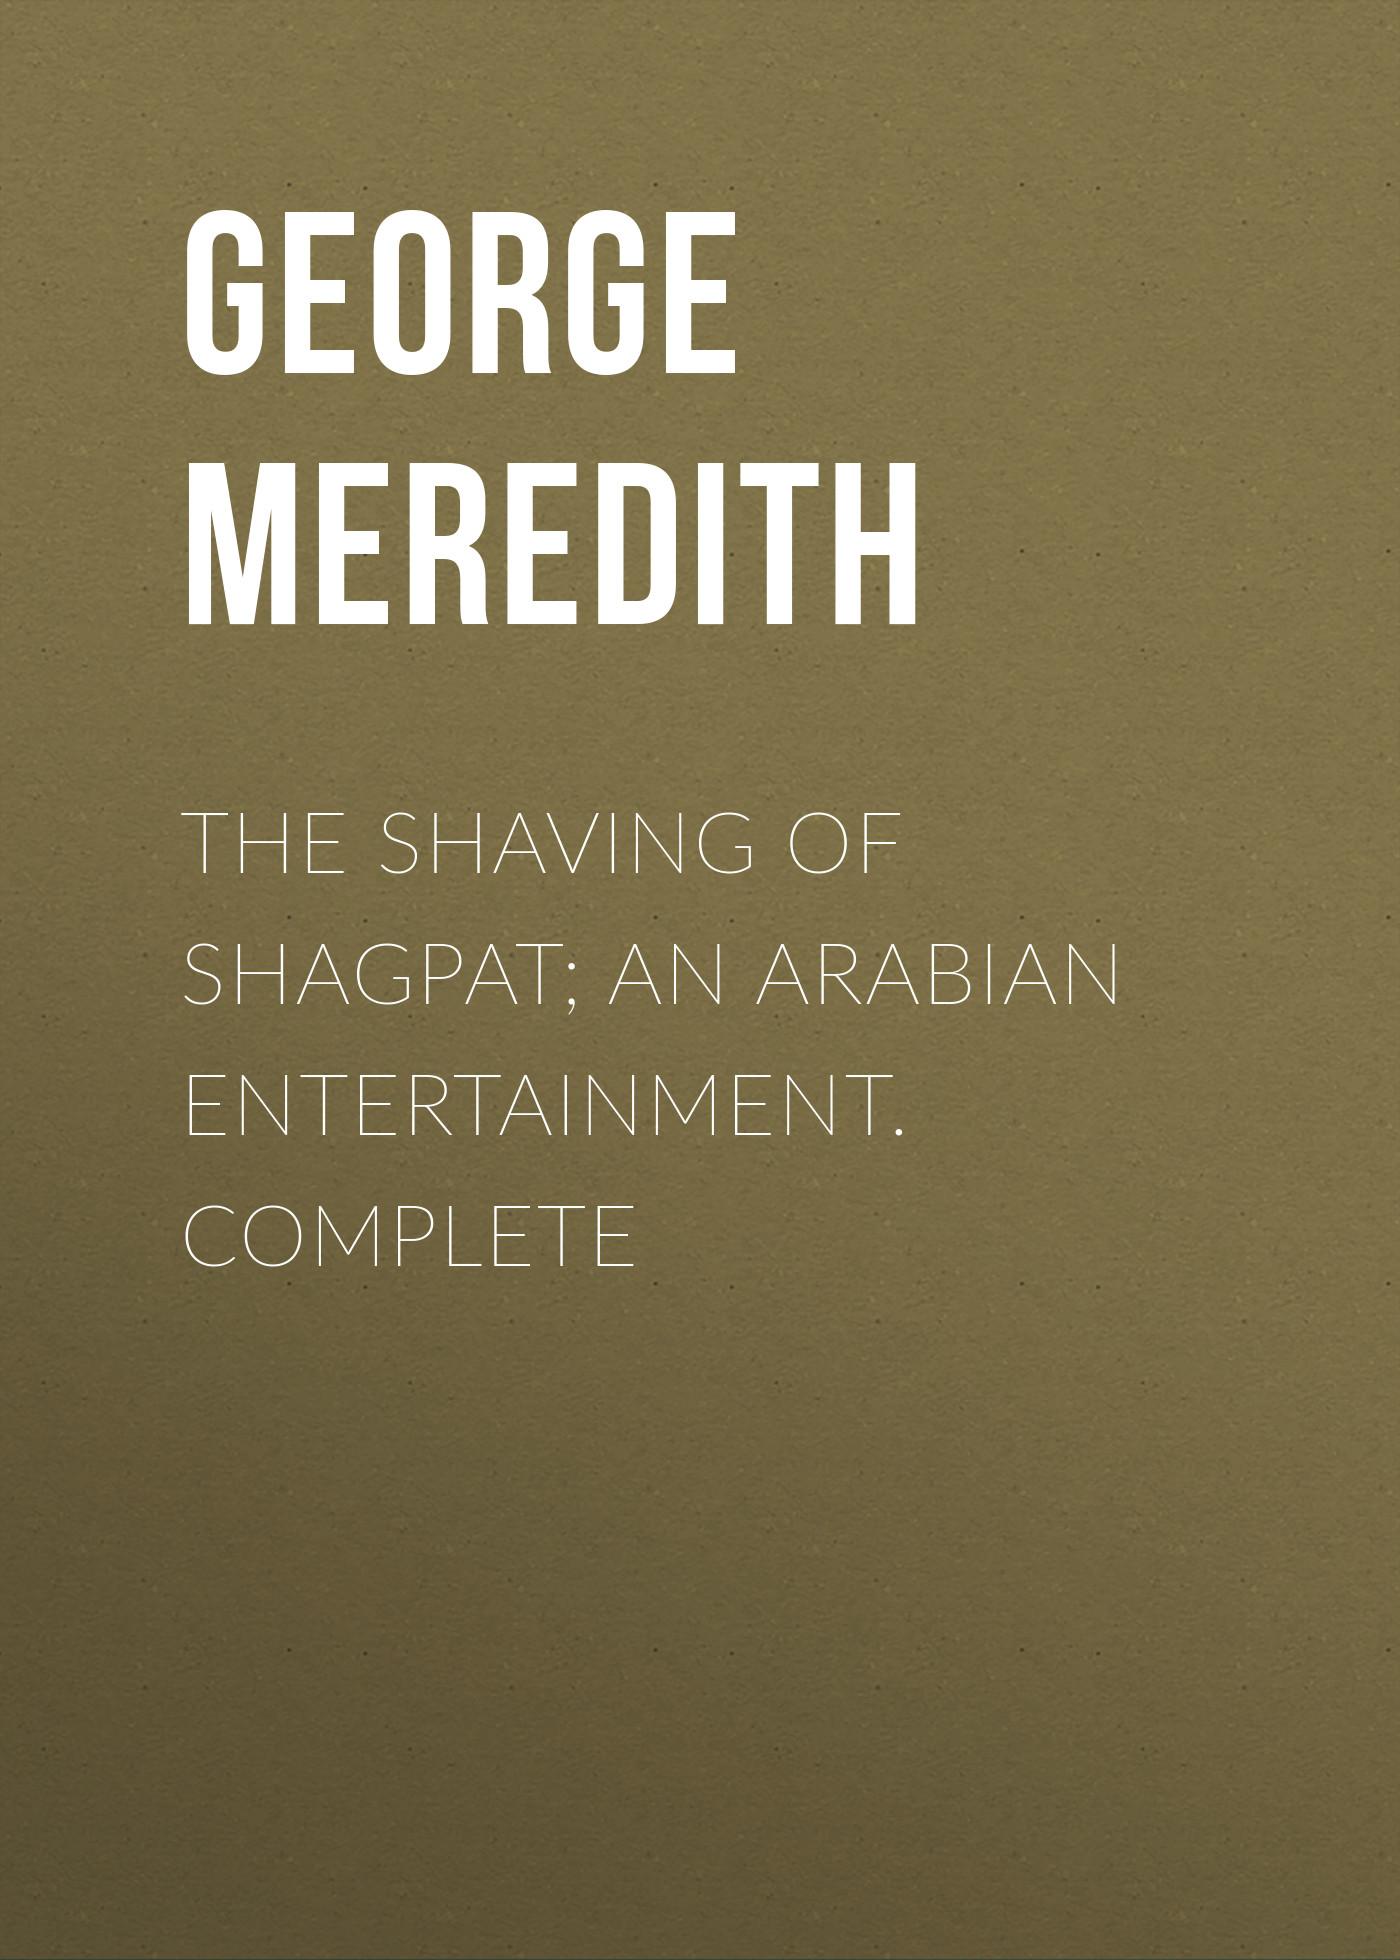 The Shaving of Shagpat; an Arabian entertainment. Complete